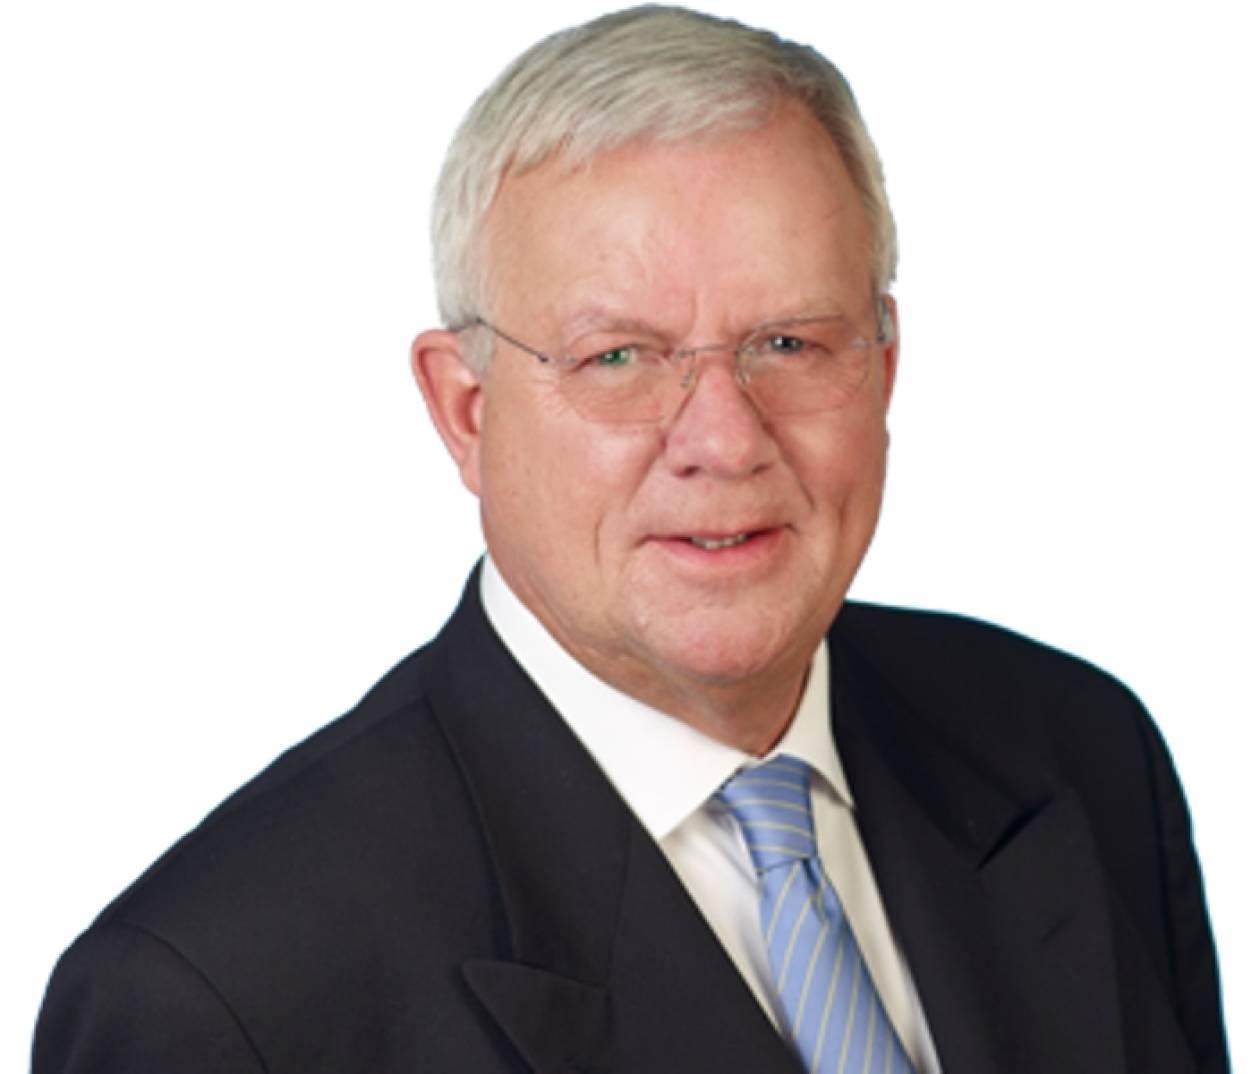 Fuchs: Η S&P πρέπει να υποβαθμίσει και τη Μ. Βρετανία